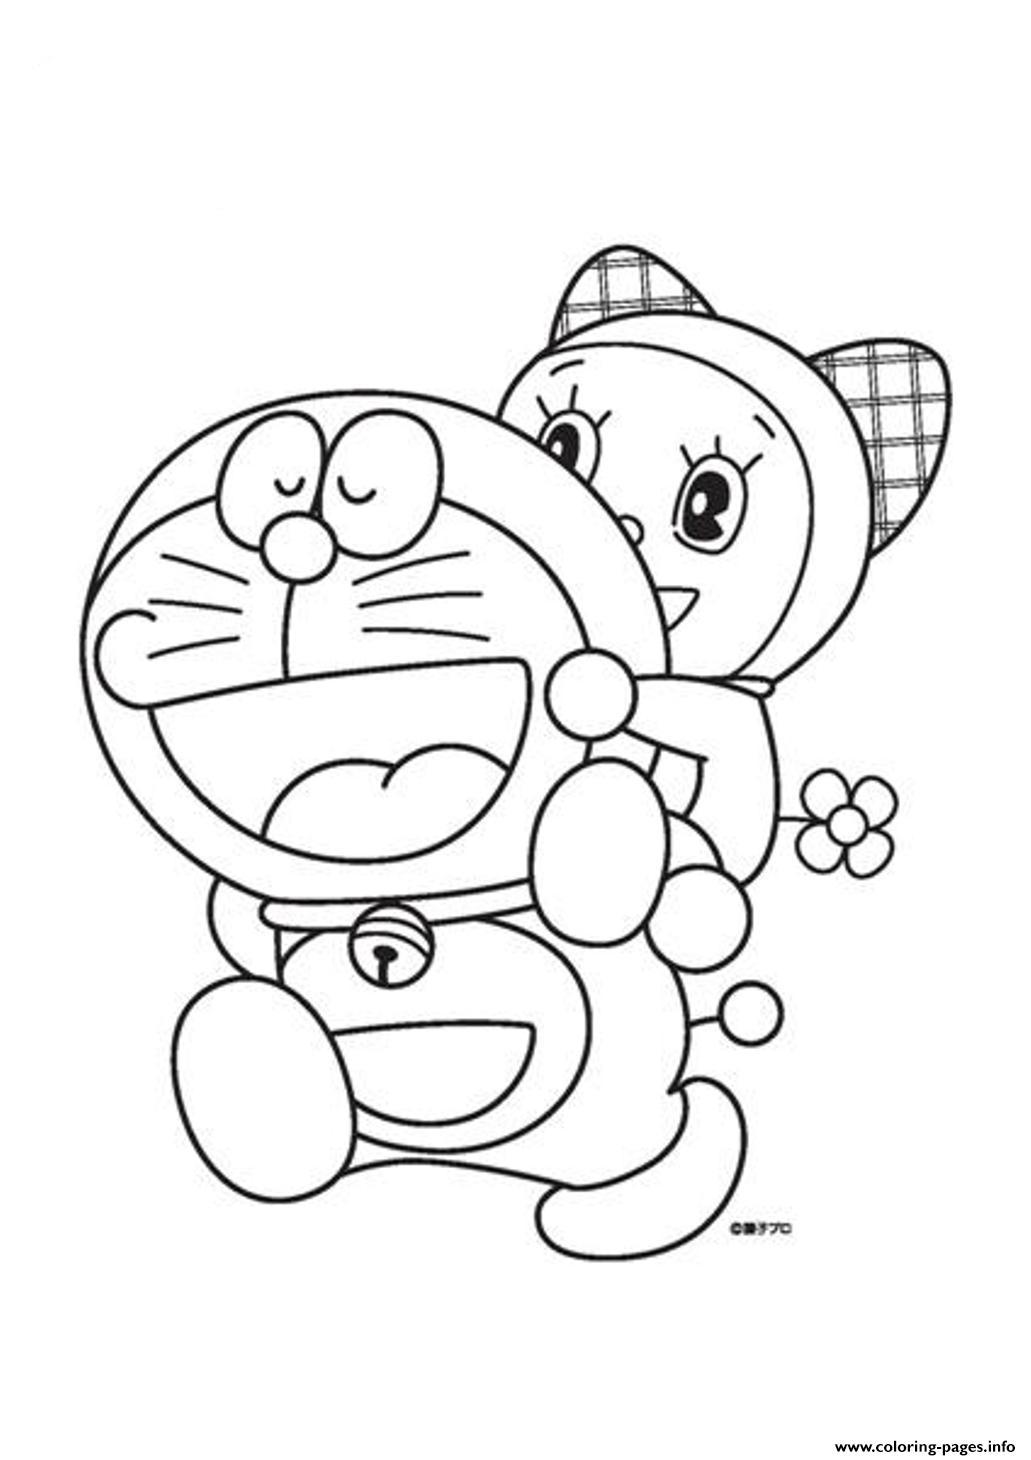 Cartoon s doraemon for kidsd6d2 coloring pages printable for Doraemon da colorare